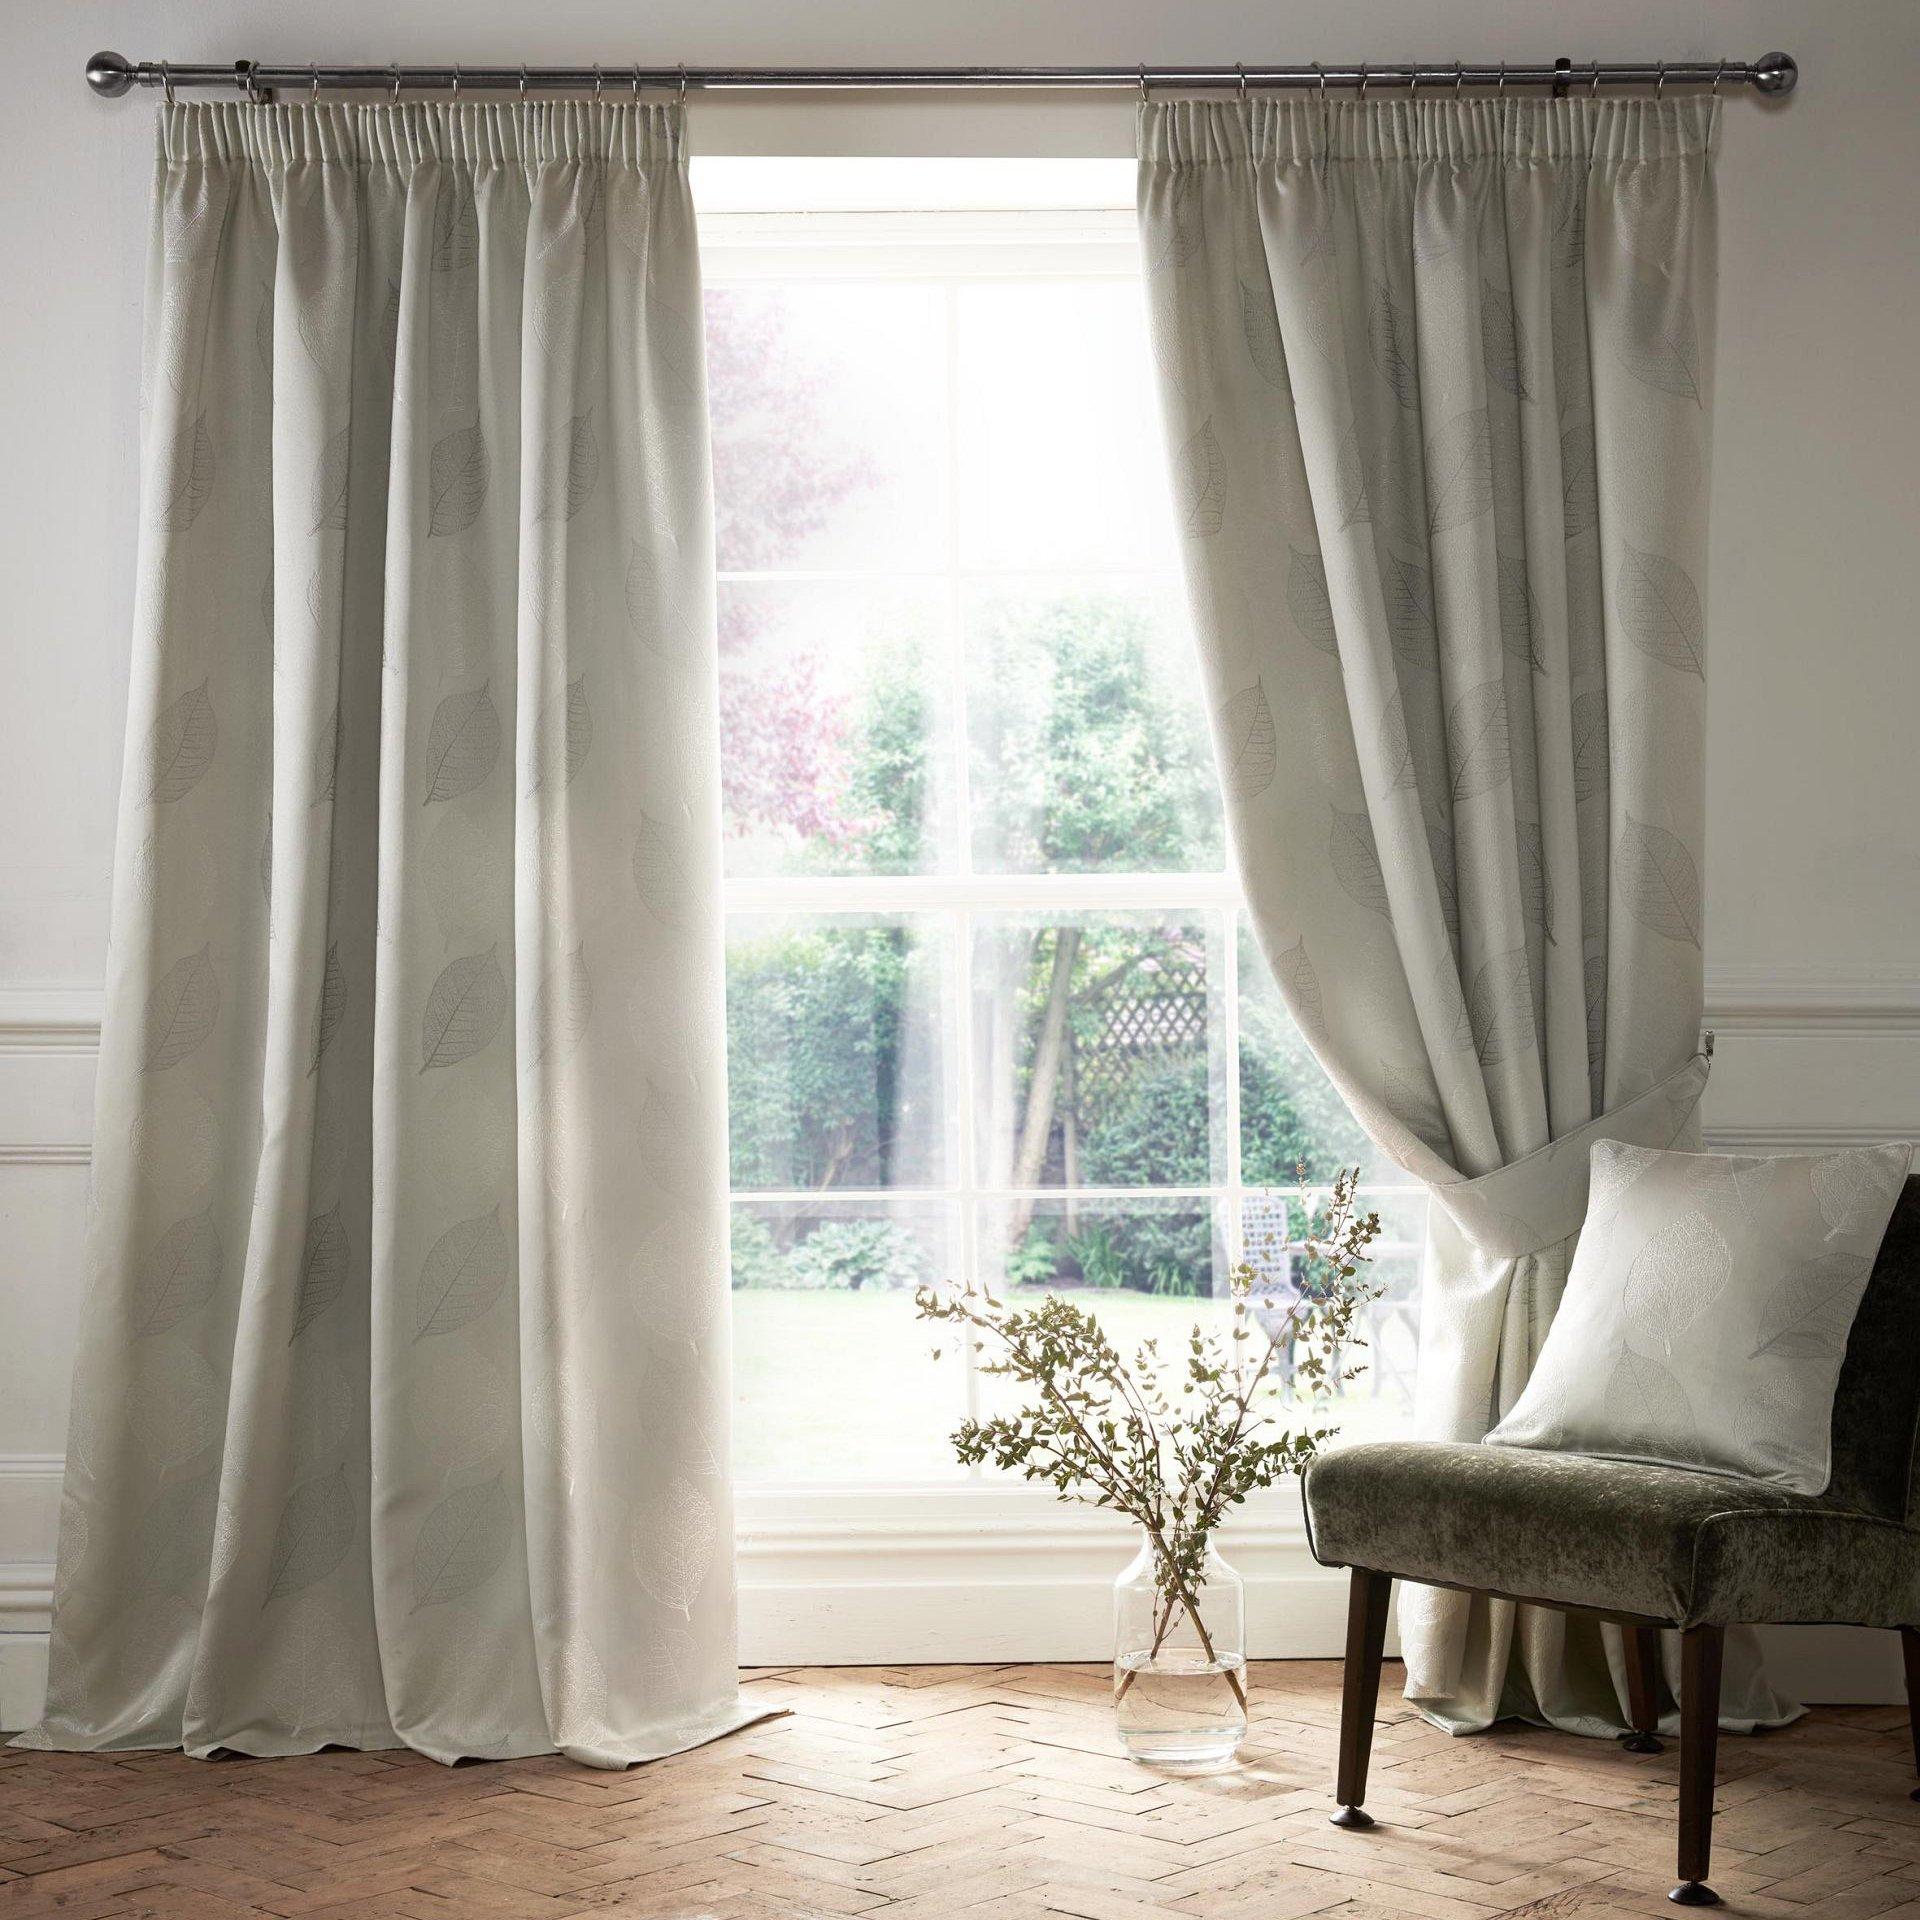 Village-fabrics-Curtains-Ashwell-Silver